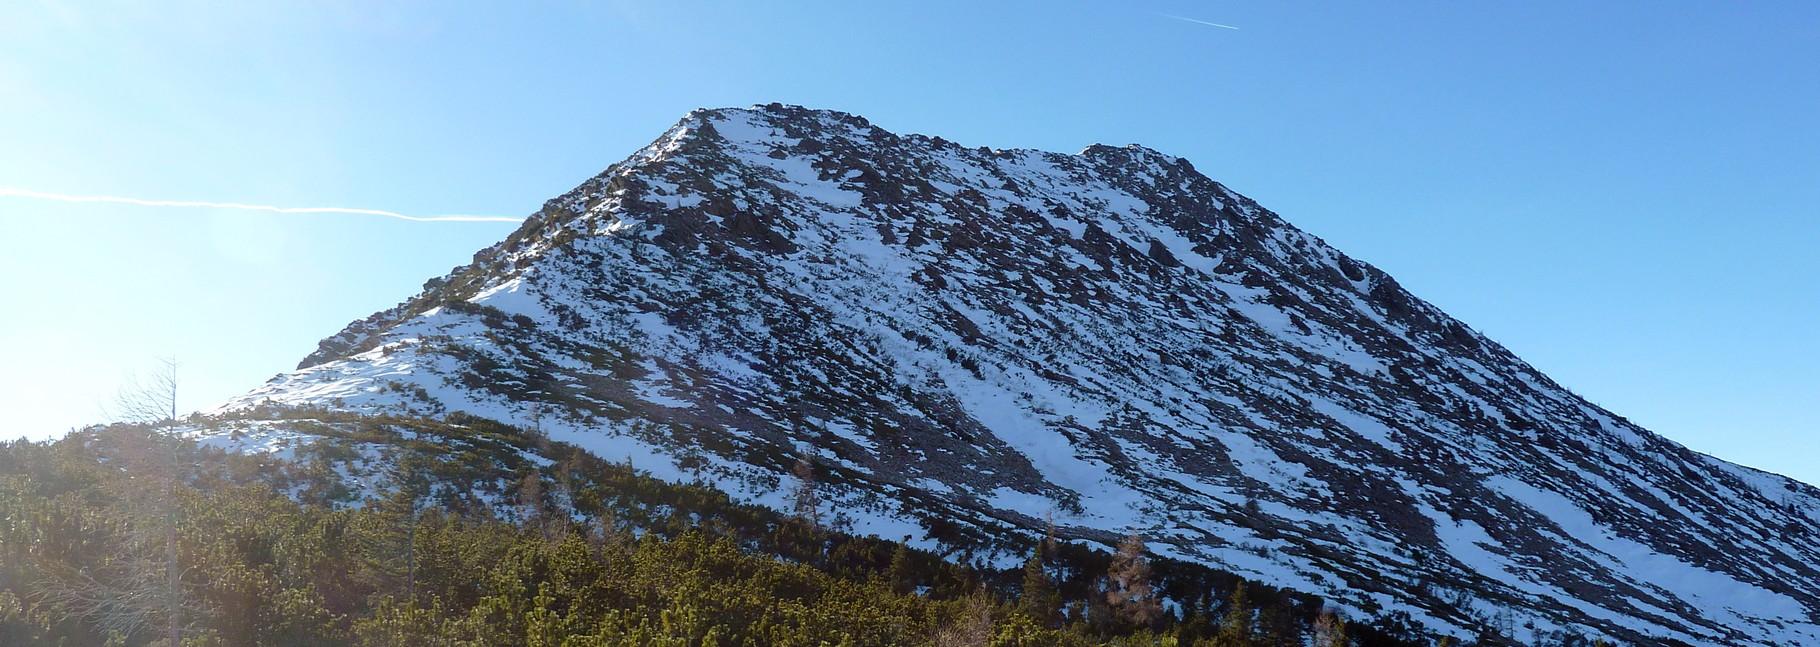 Ein lohnenswerter Gipfel Wizi´s Bergwelt Das Tourenportal